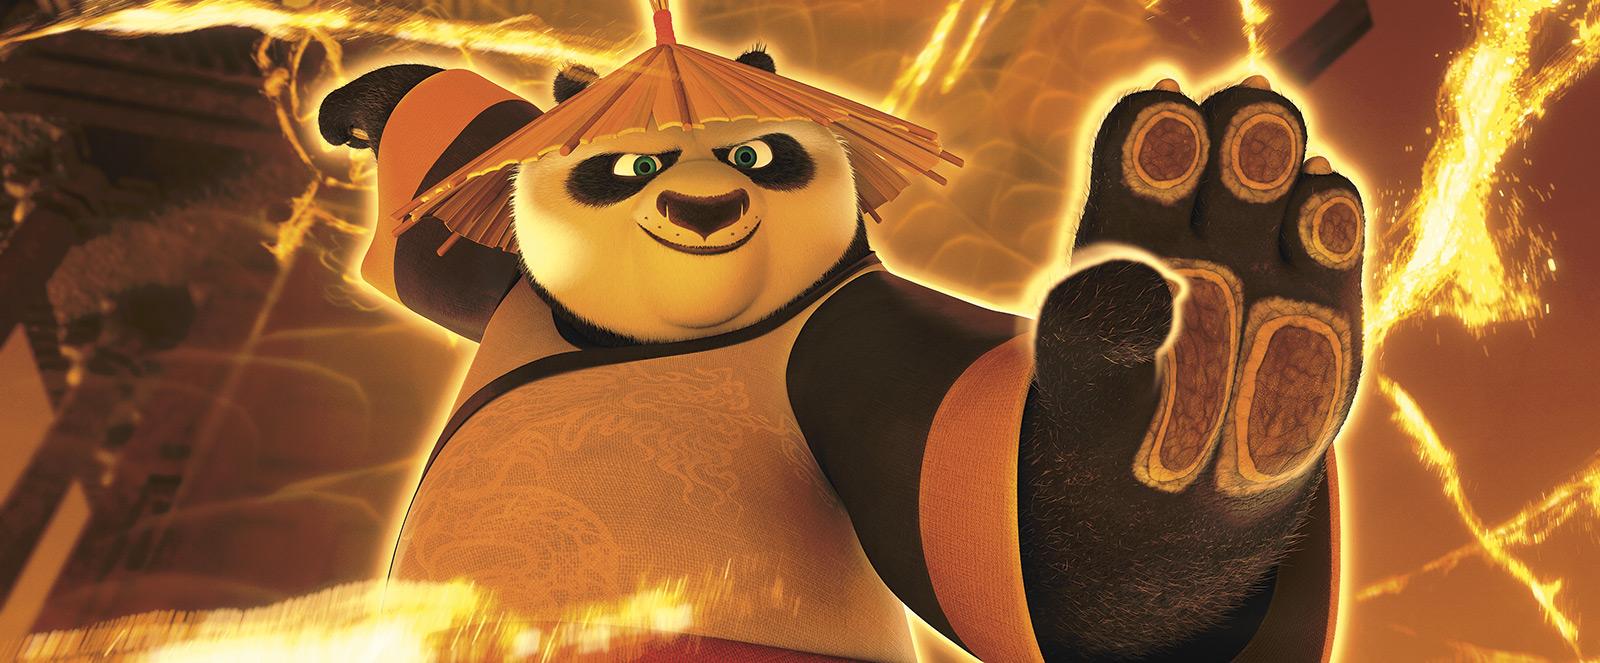 Kung-Fu-Panda-3-Review-3